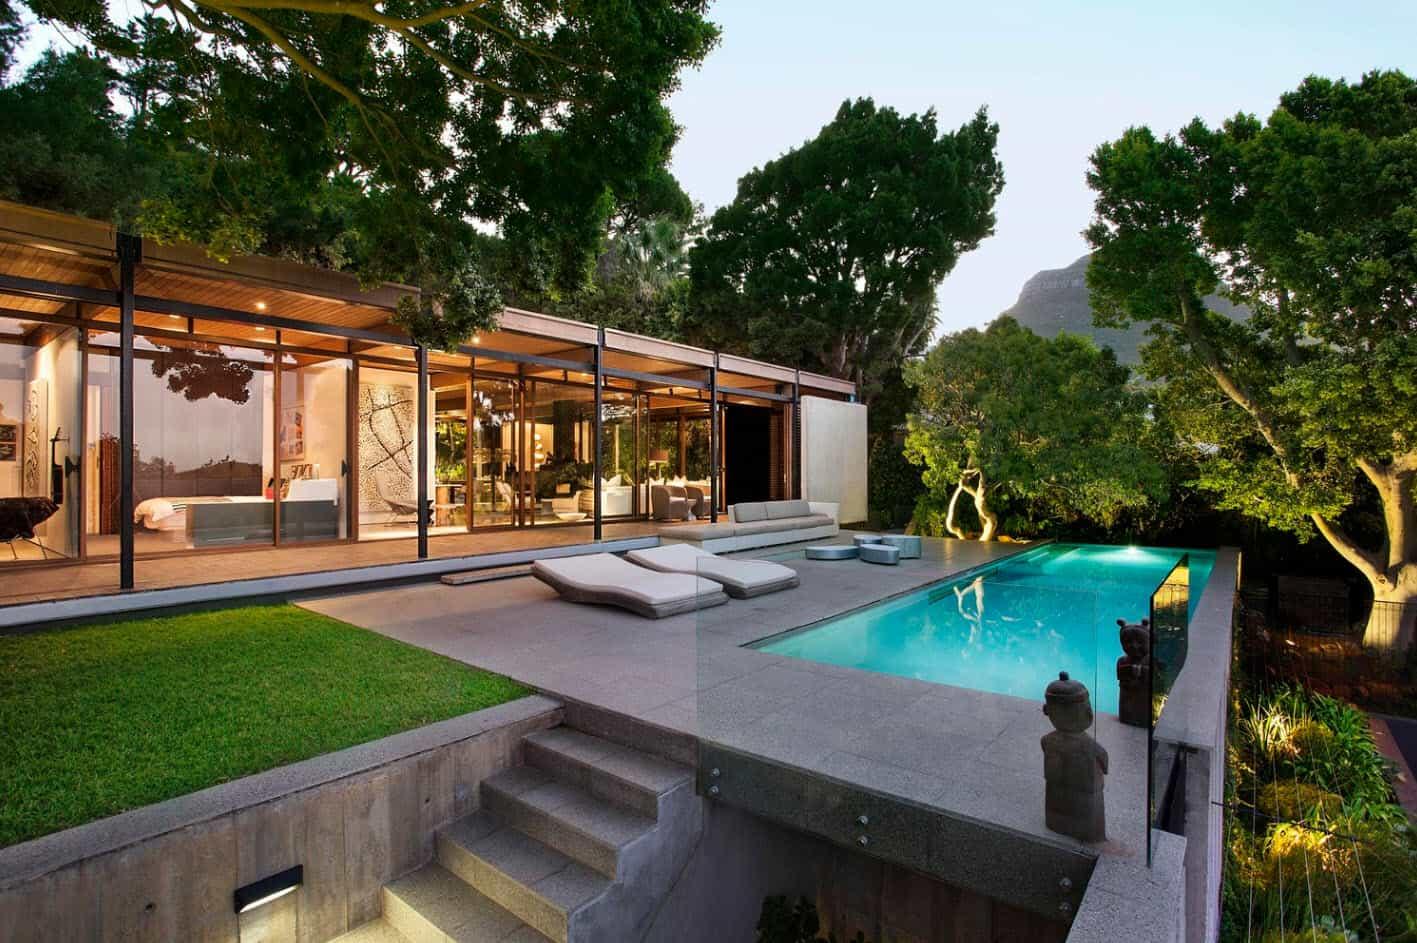 moderna casa de monta a con vistas impresionantes a la